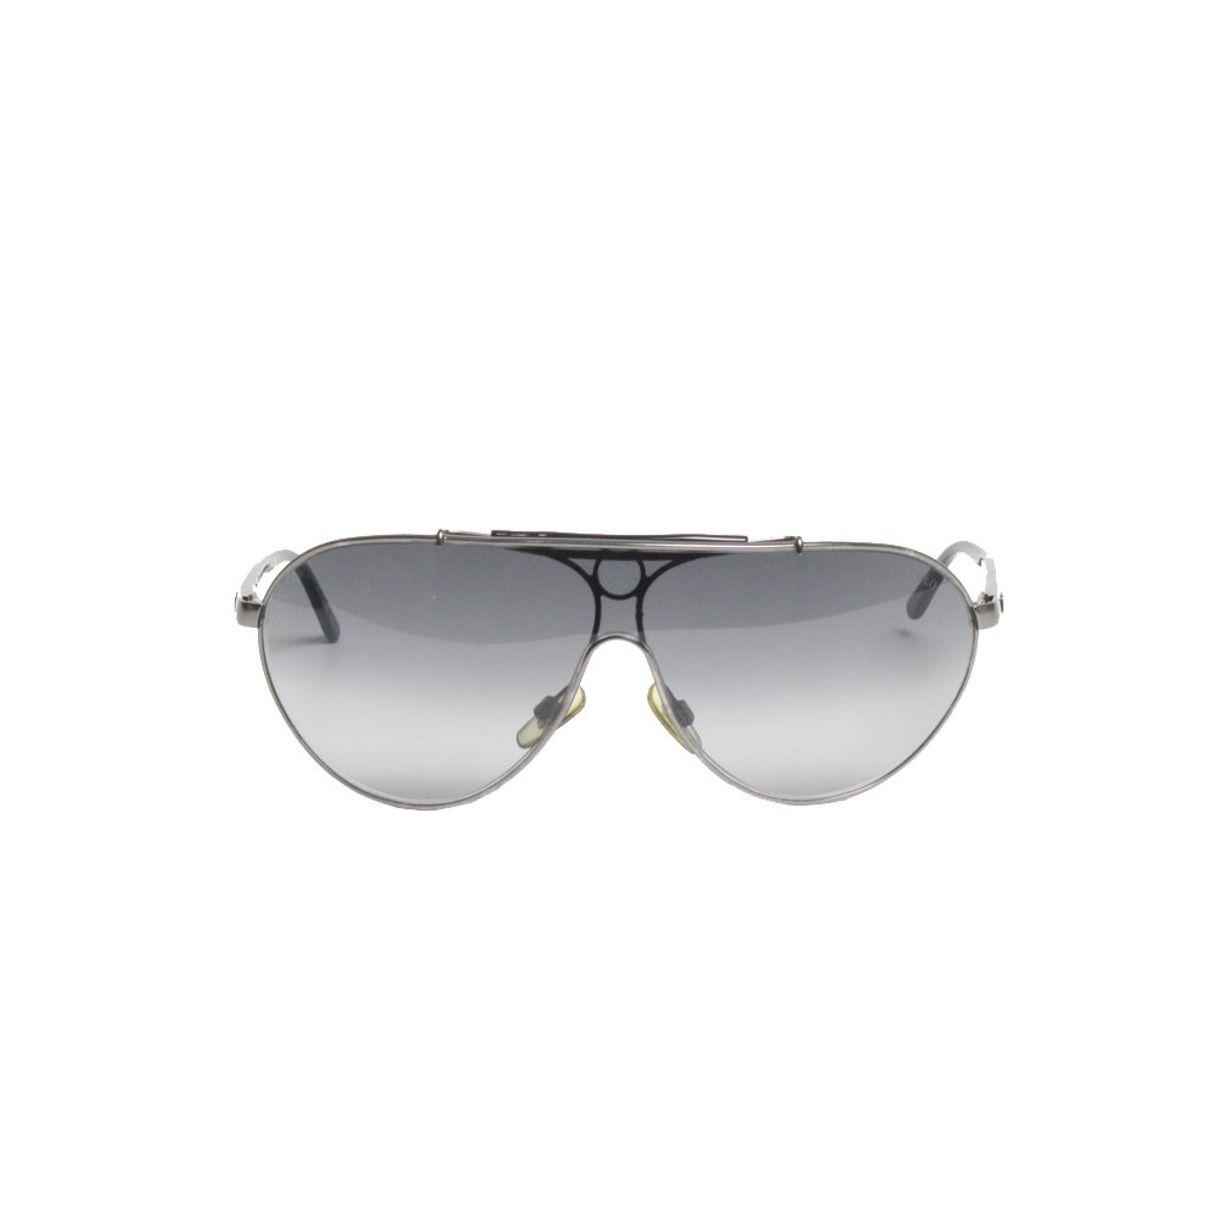 Oculos-polo-ralph-lauren-masculino